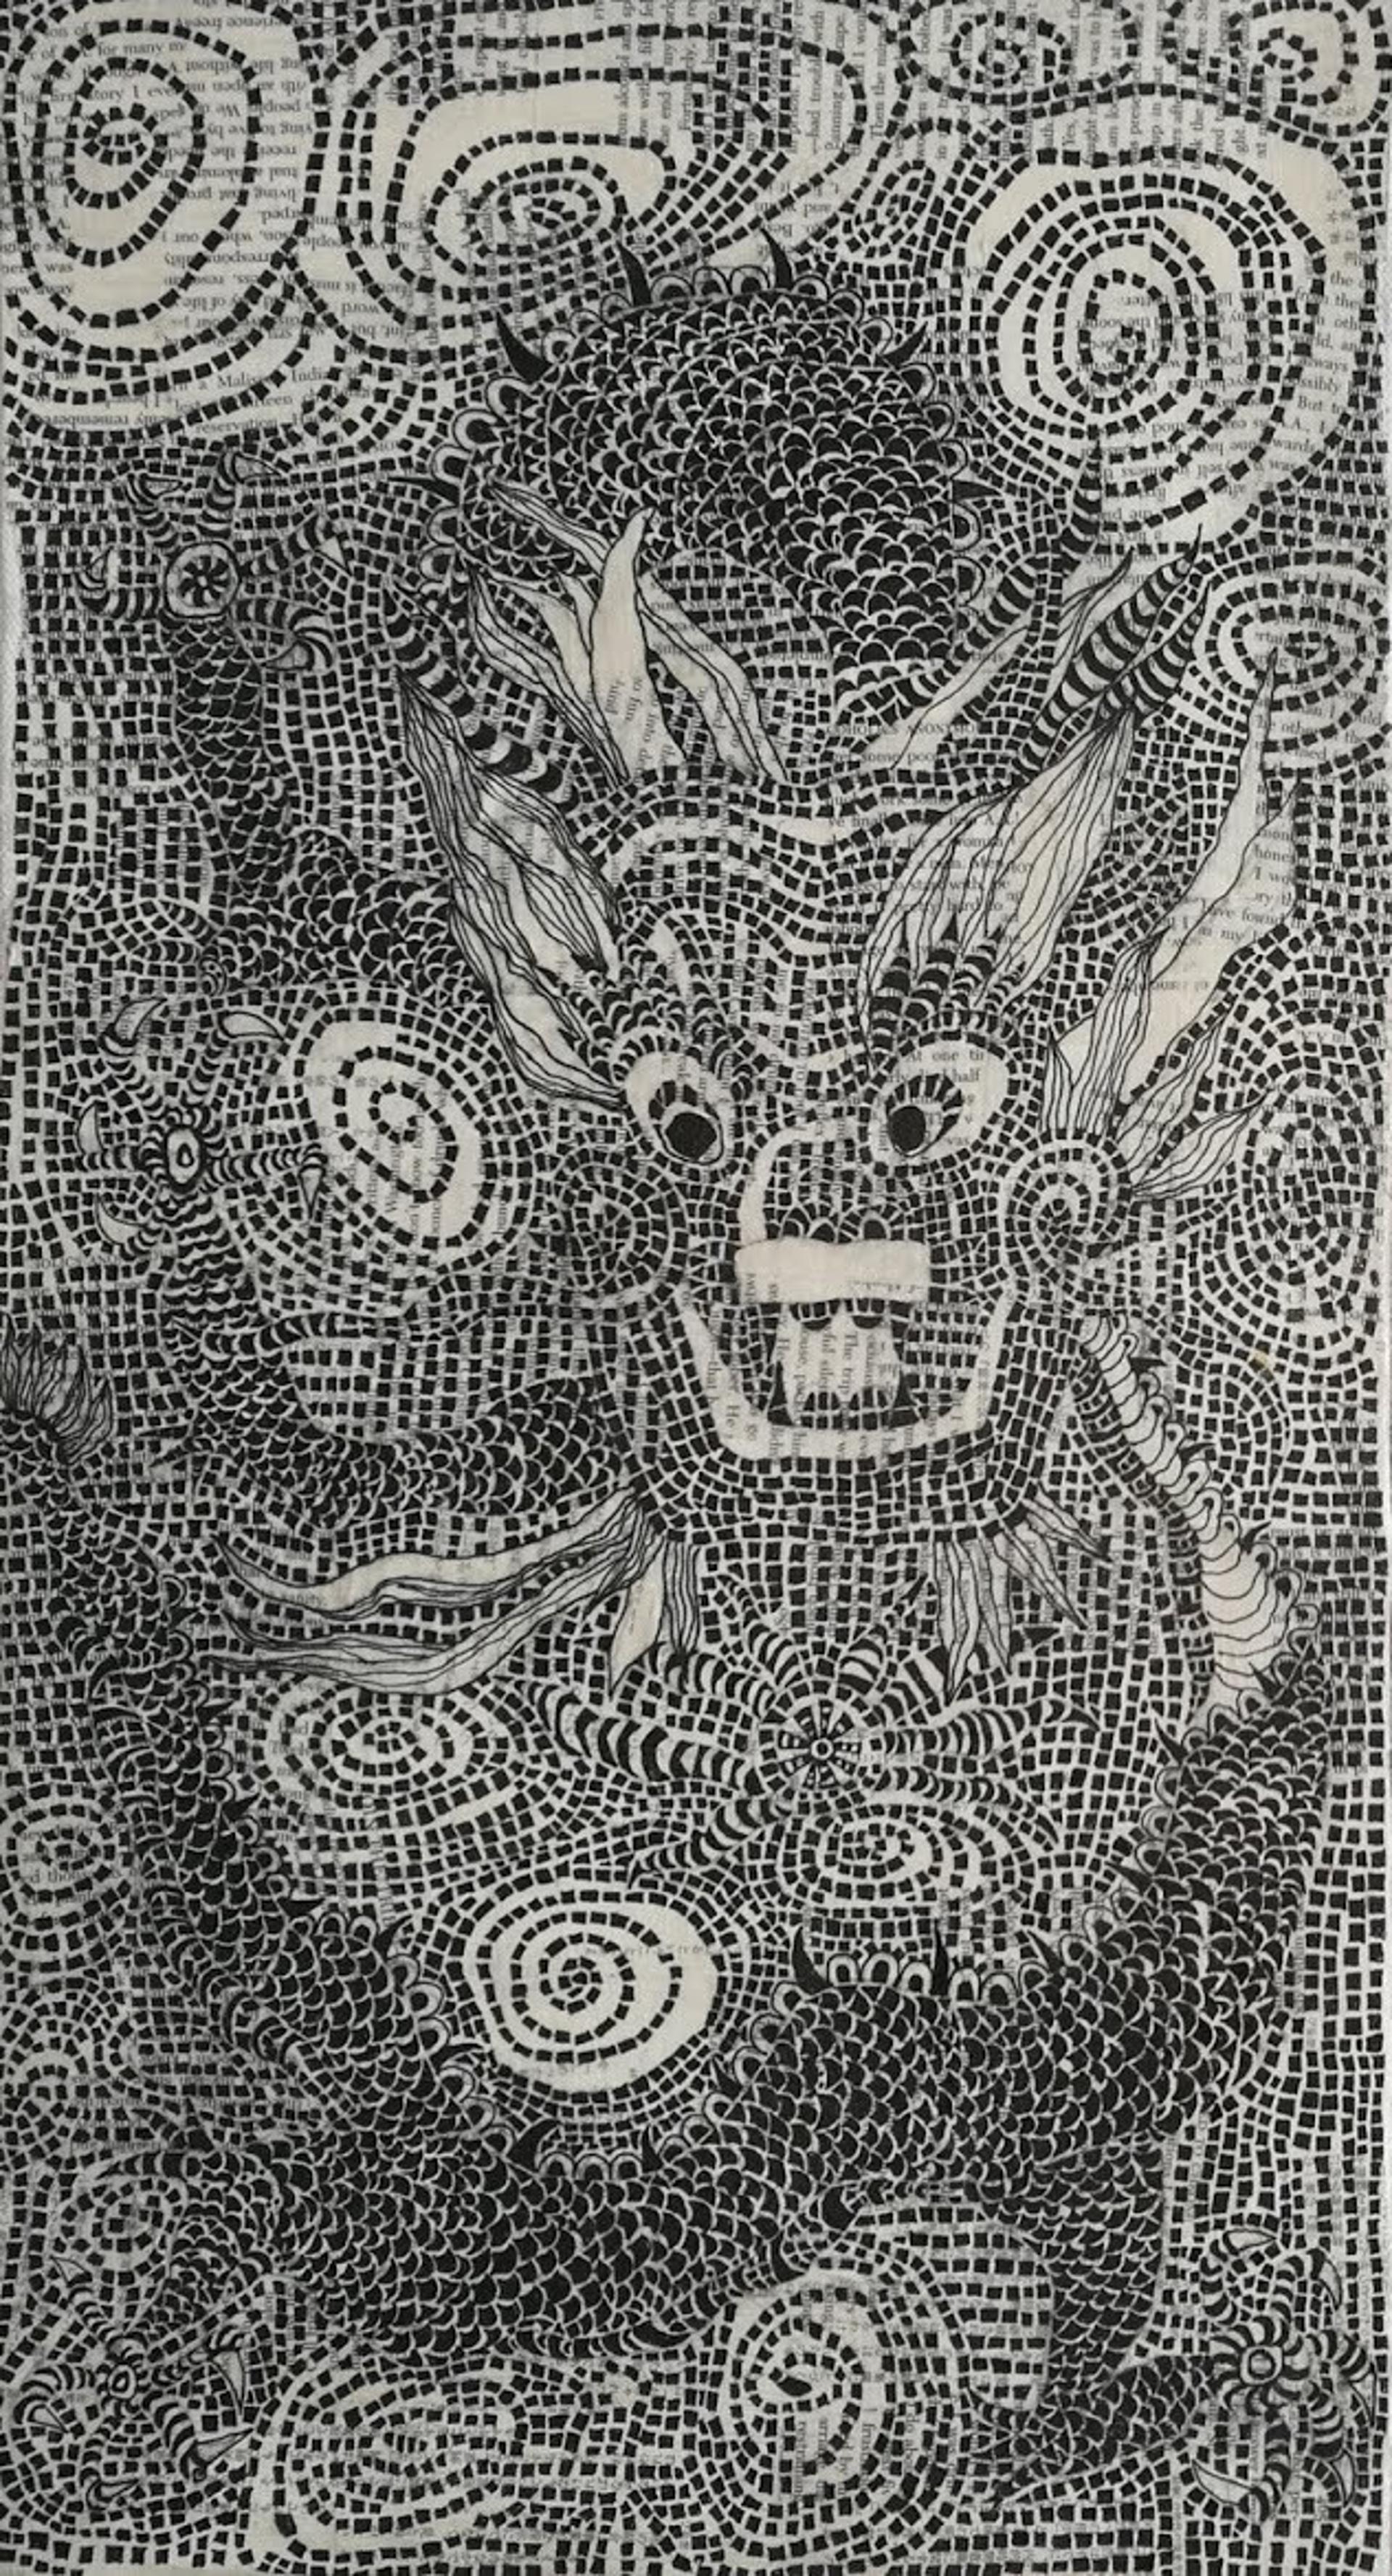 Land Dragon (The Land Dragon) by Chau Huynh